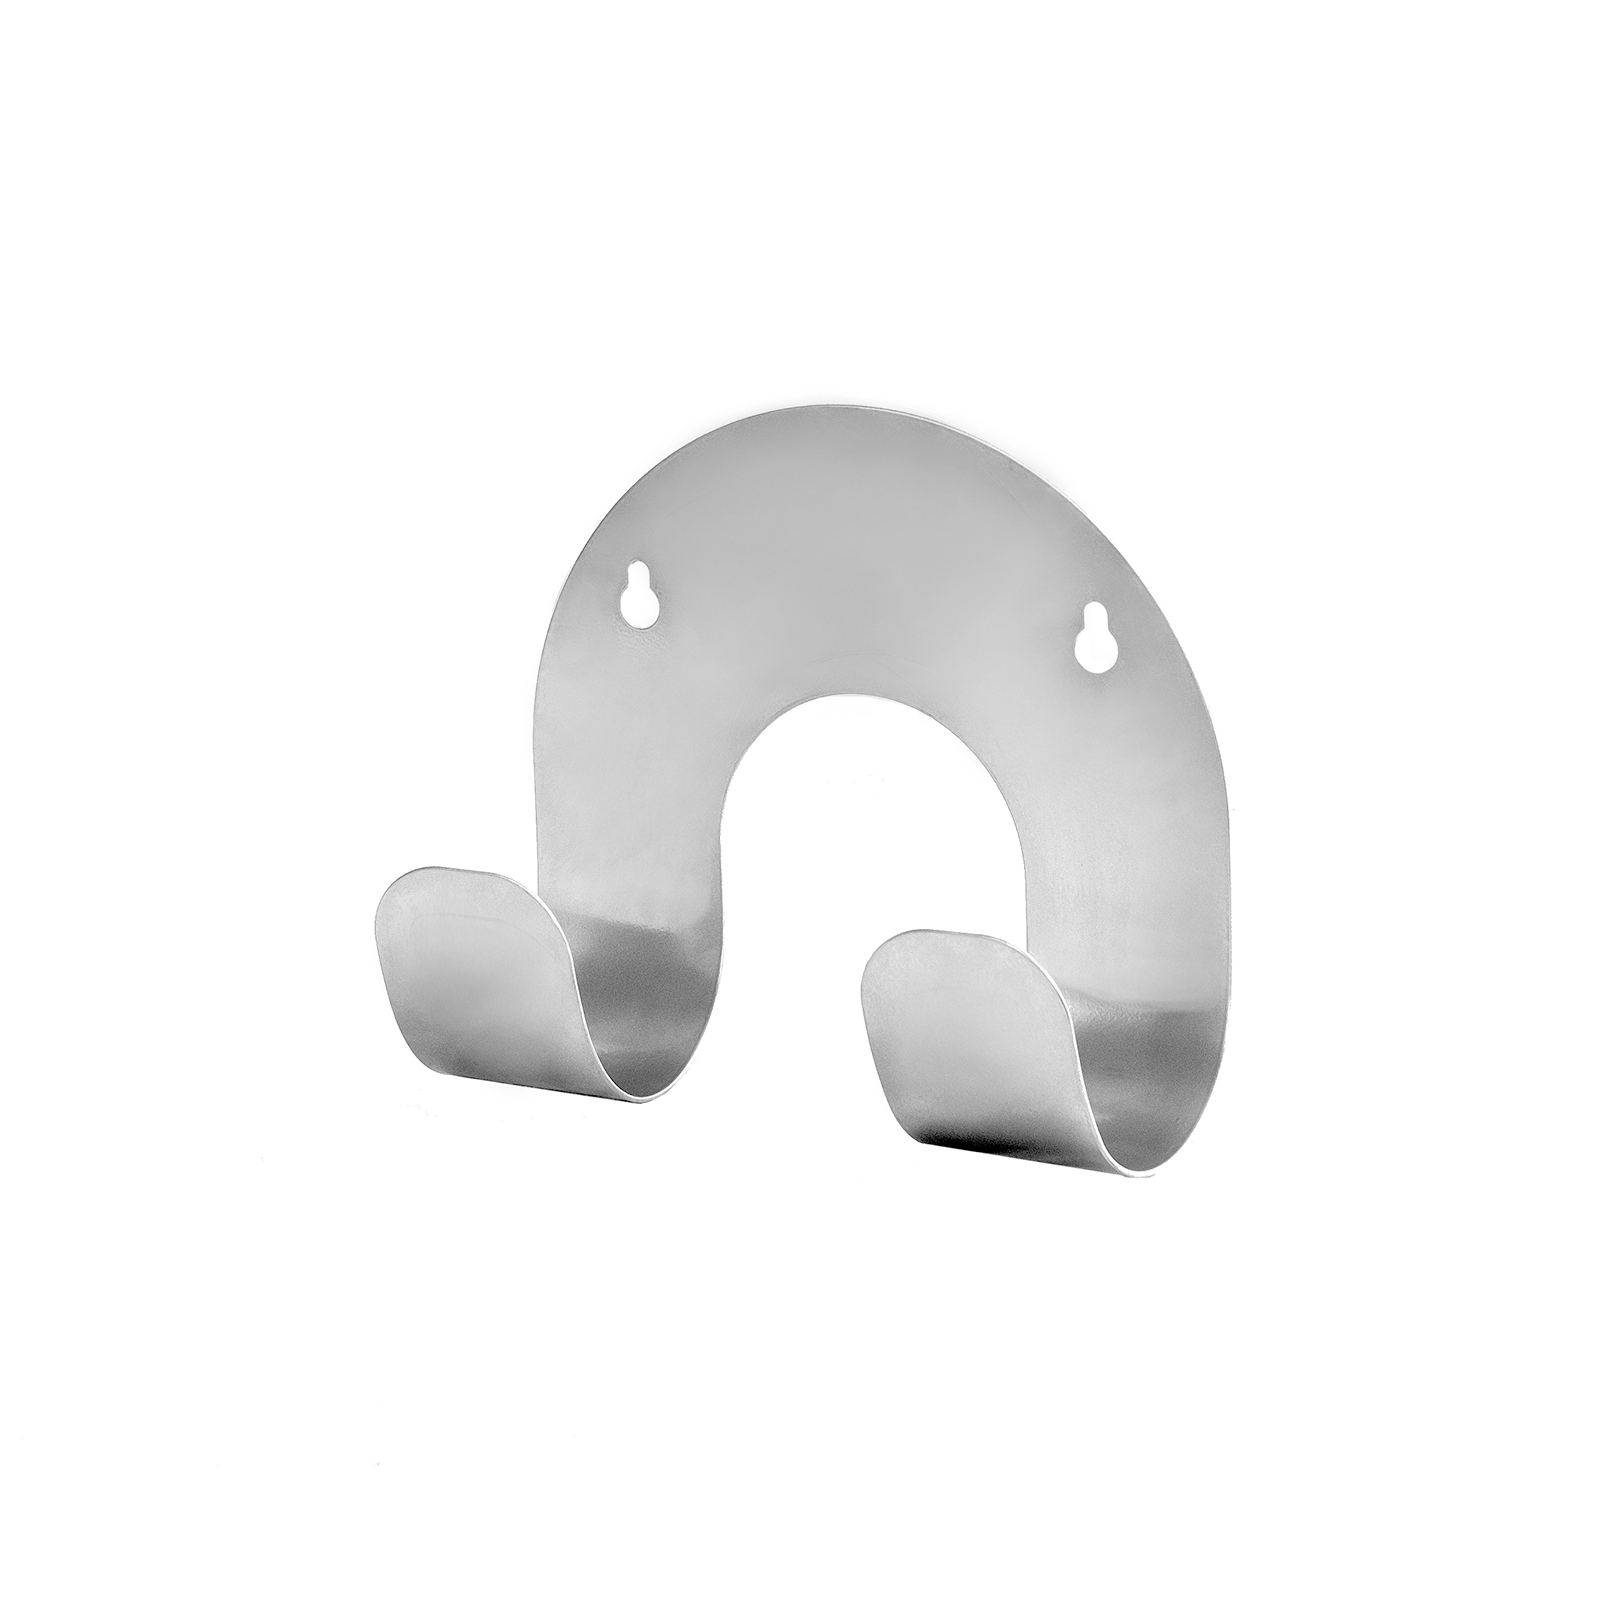 Haxbury Silver Savanna Hose Hook